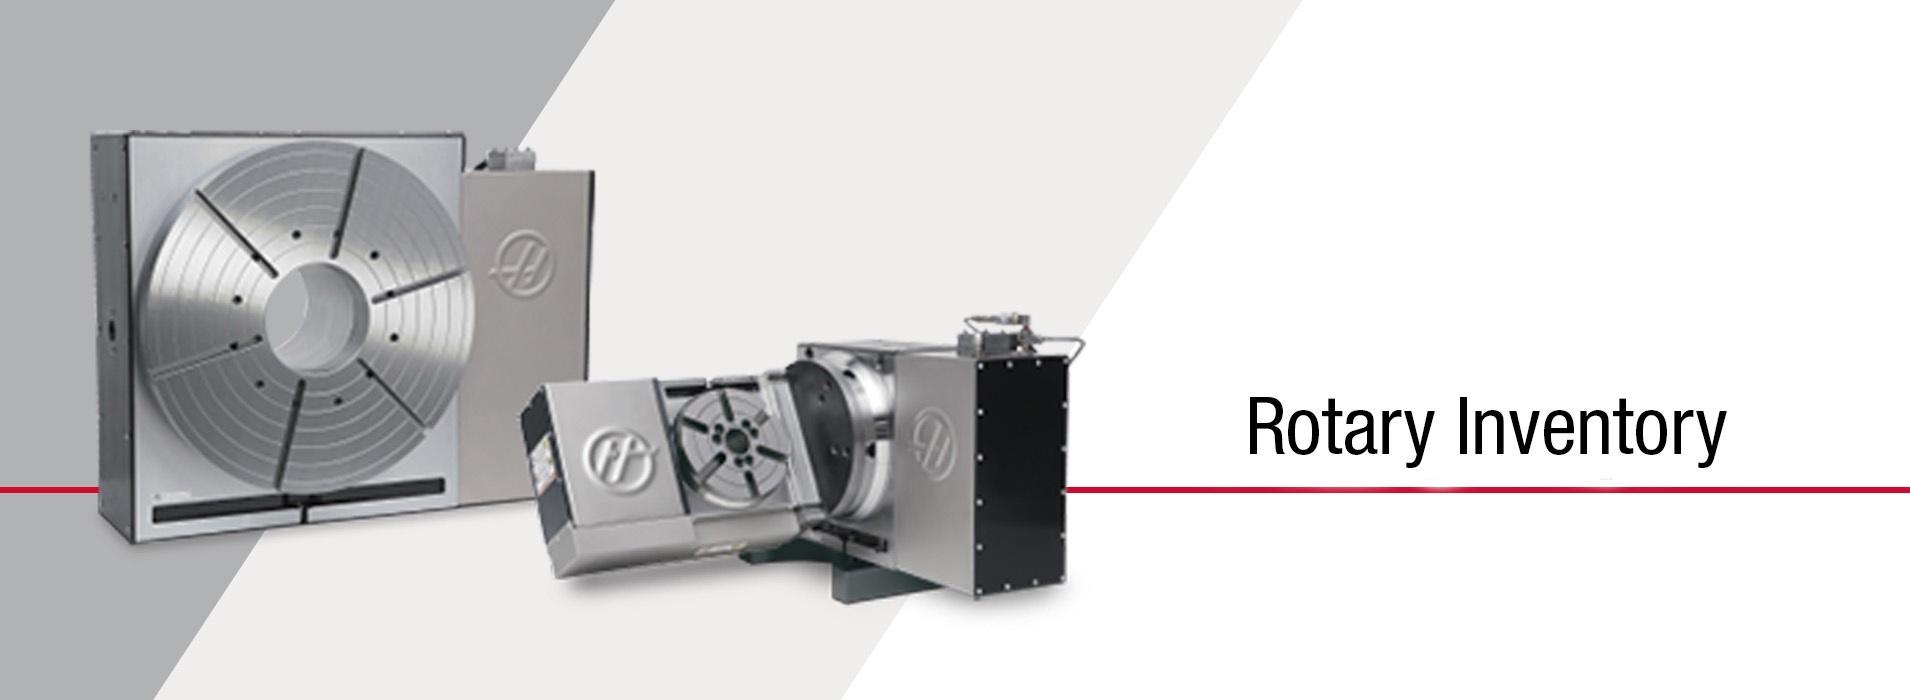 rotaryinventoryheader.jpg